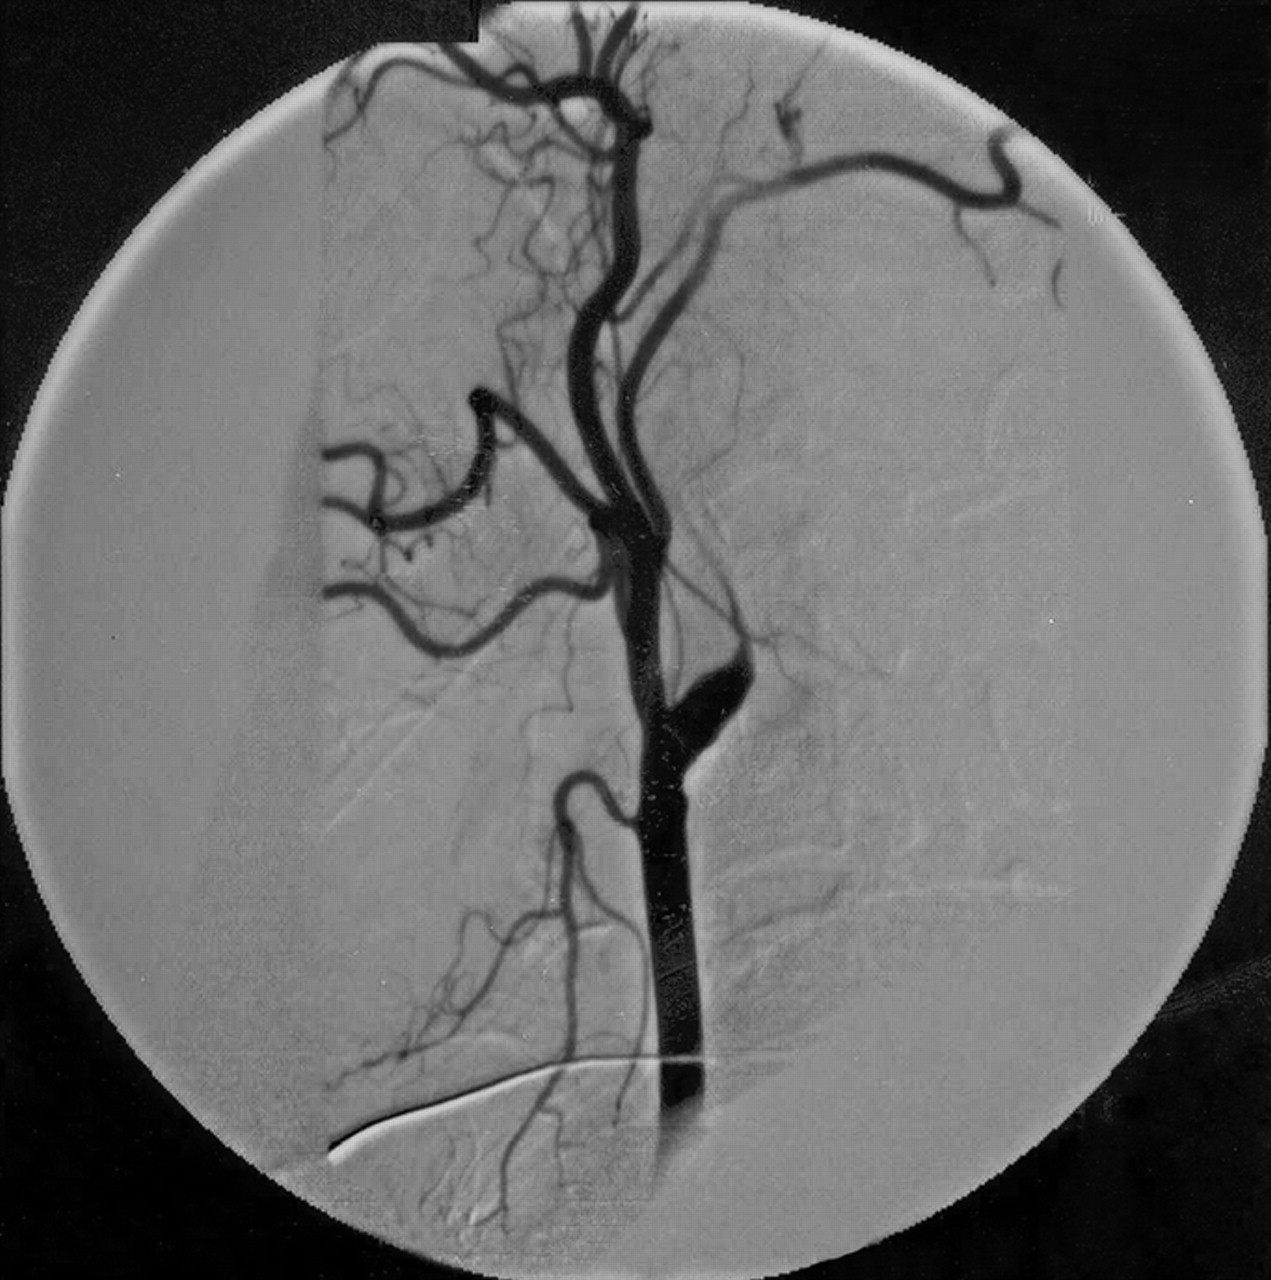 Occlusion Carotid Carotid Artery Occlusion